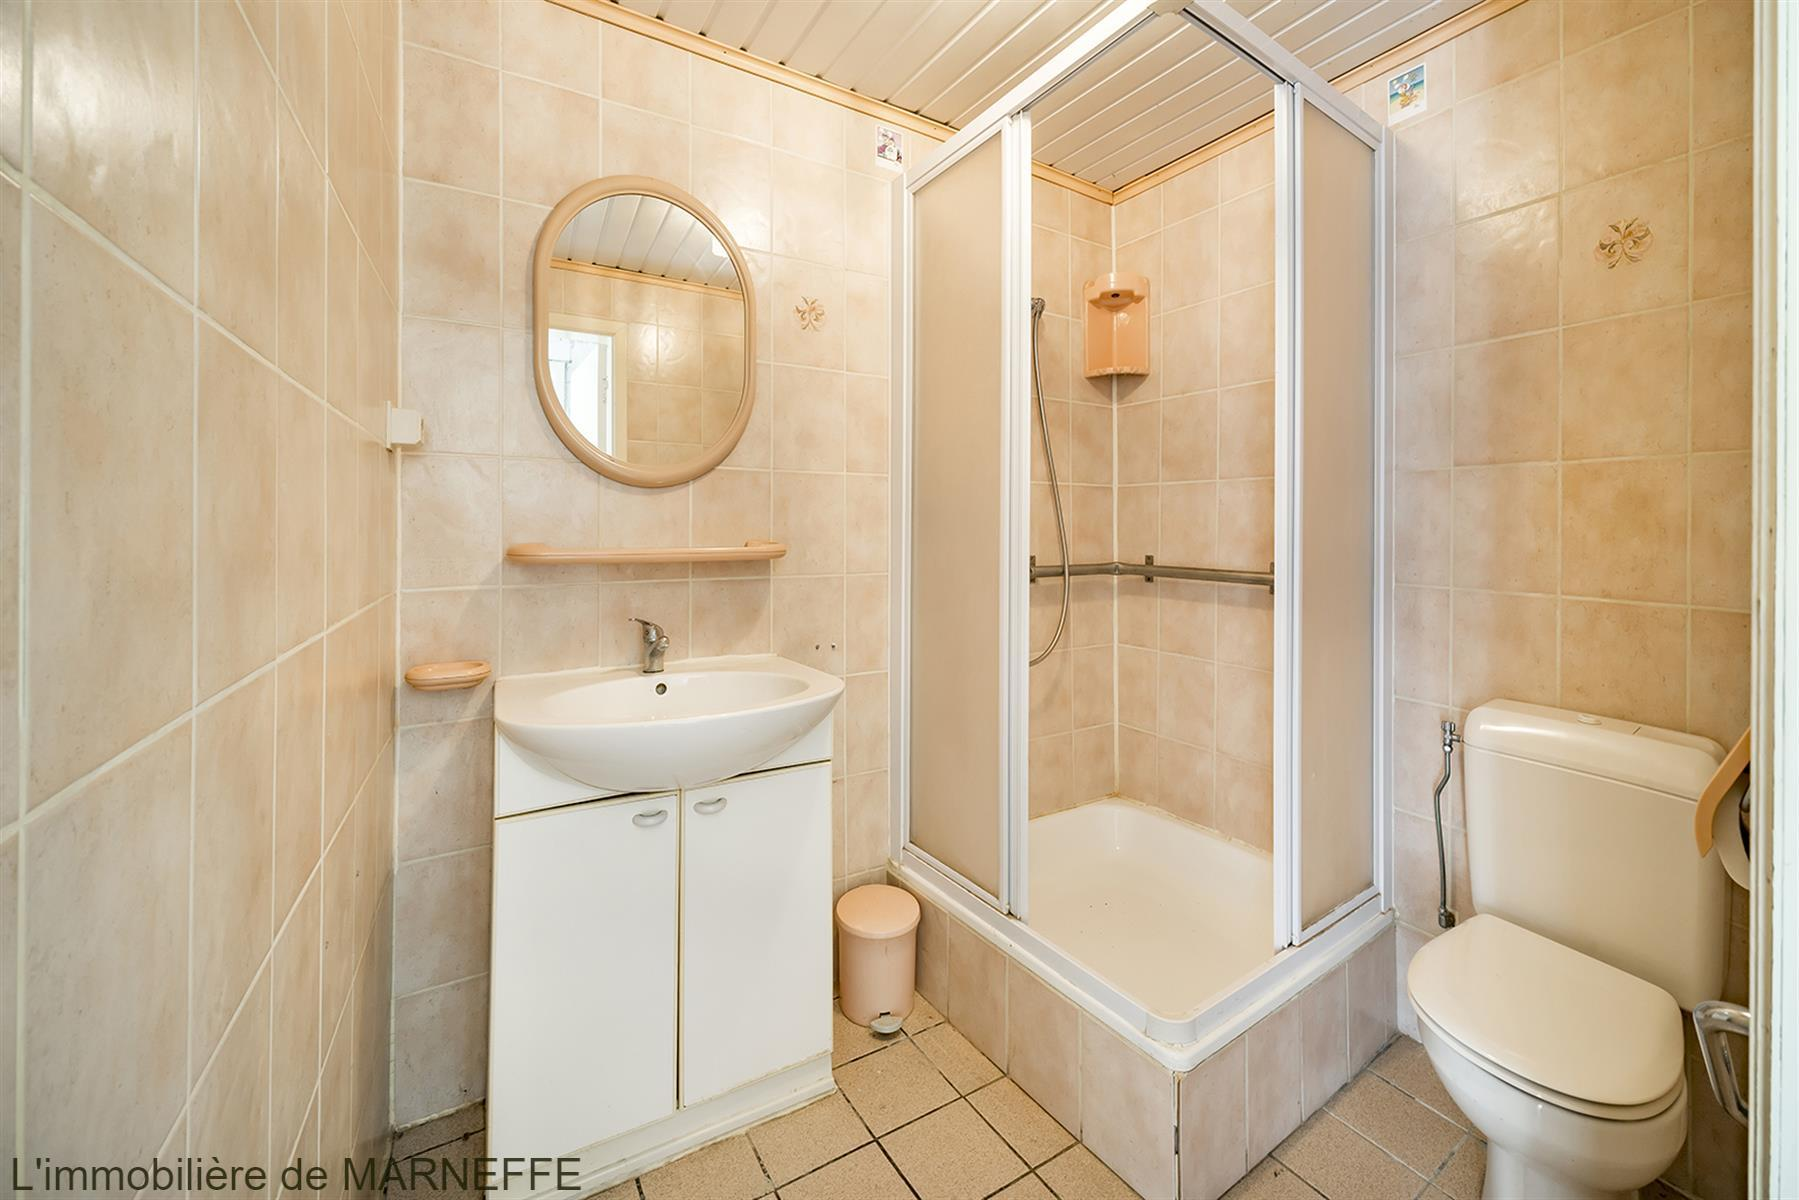 Maison - Donceel - #3683794-14